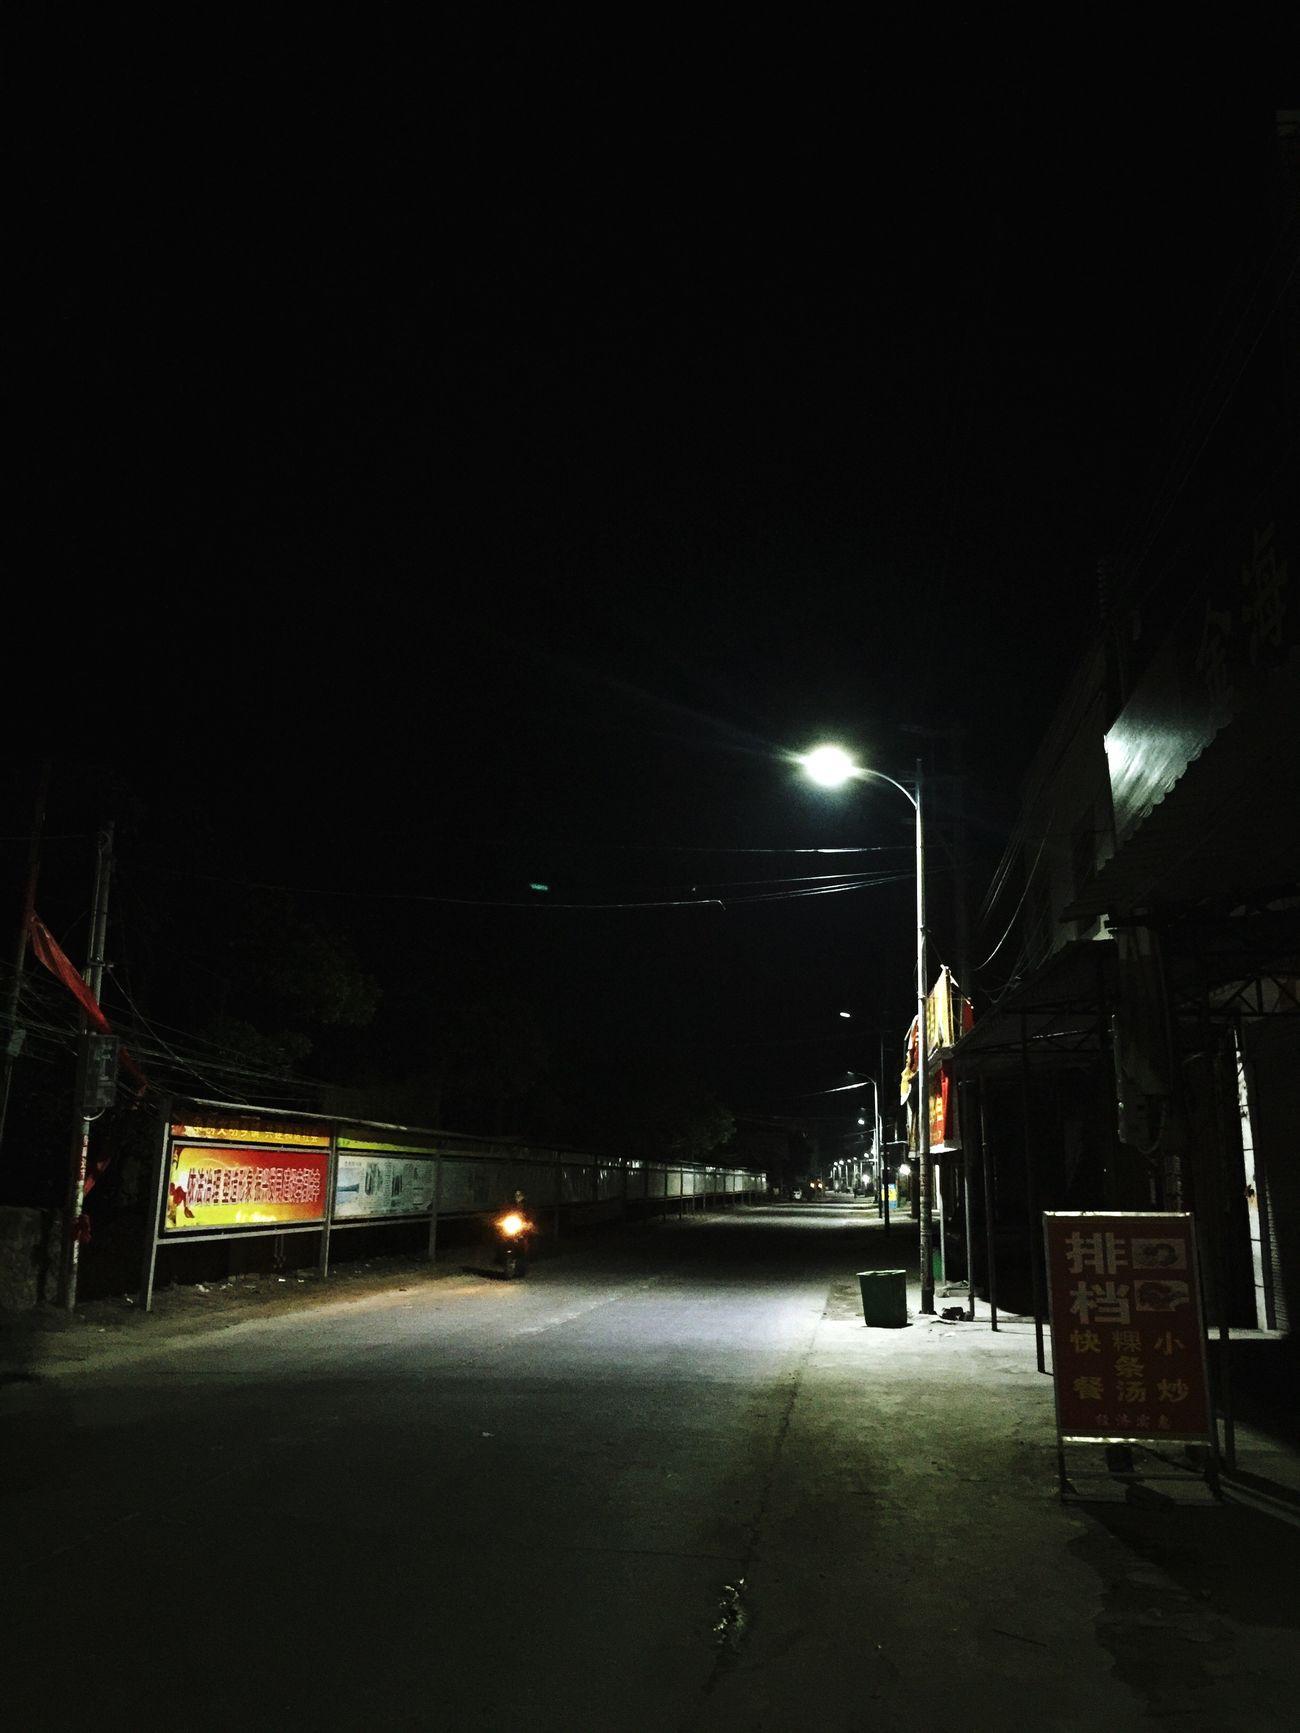 Night Illuminated Transportation Mode Of Transport Land Vehicle No People City Outdoors Architecture 景